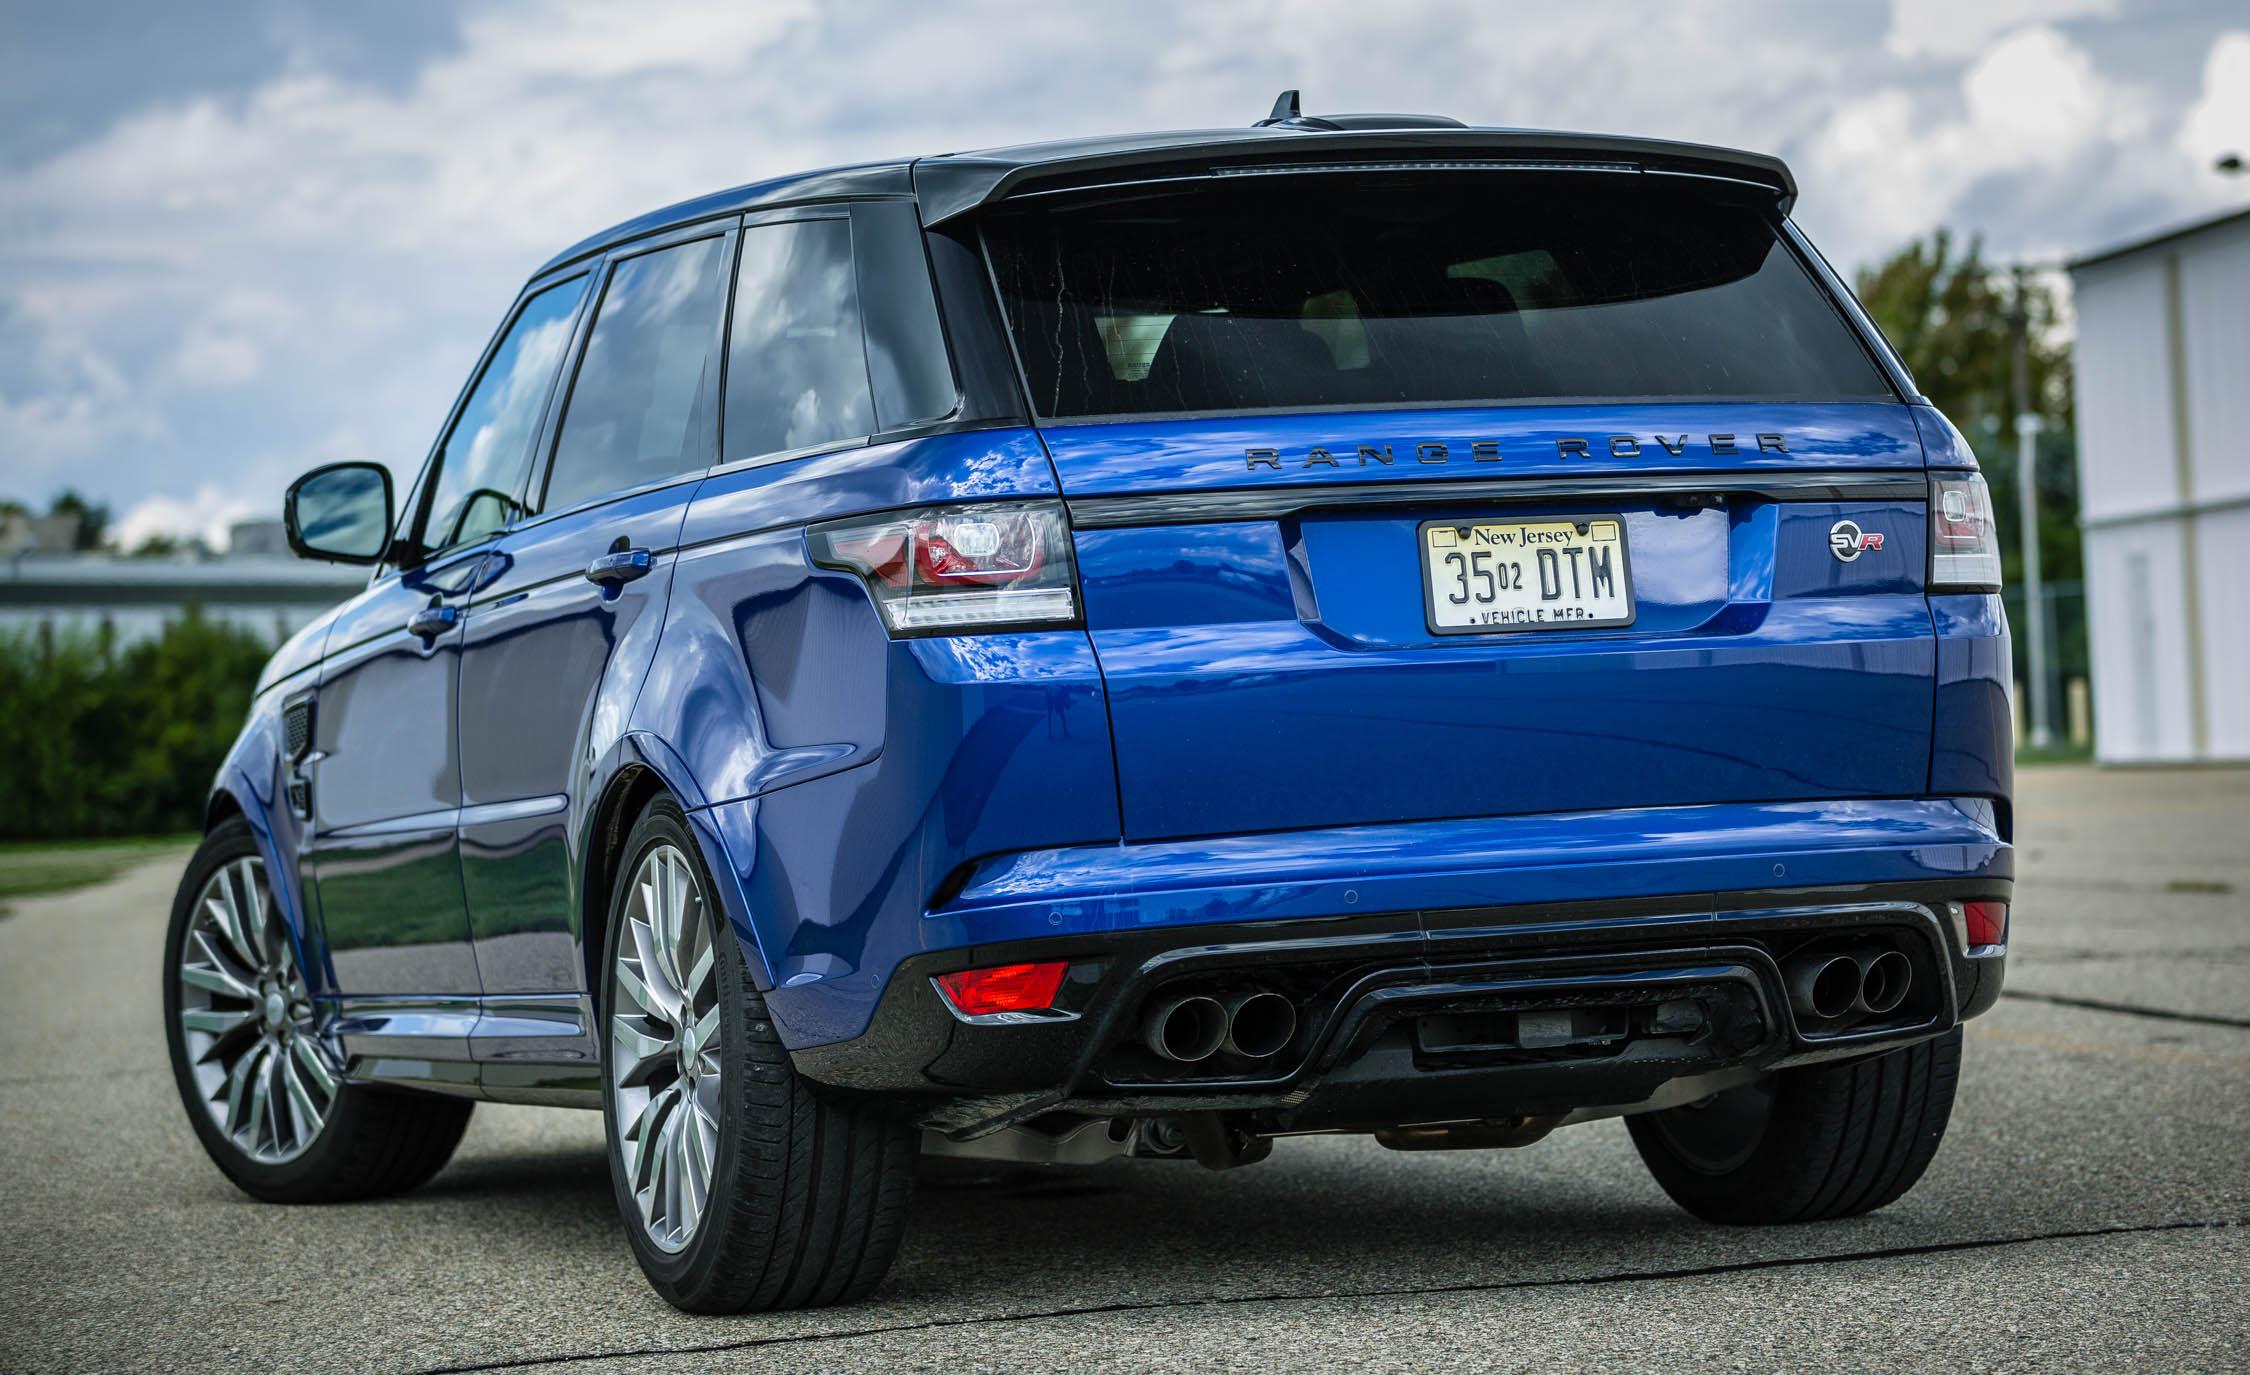 2016 Land Rover Range Rover Sport SVR (Photo 1 of 7)